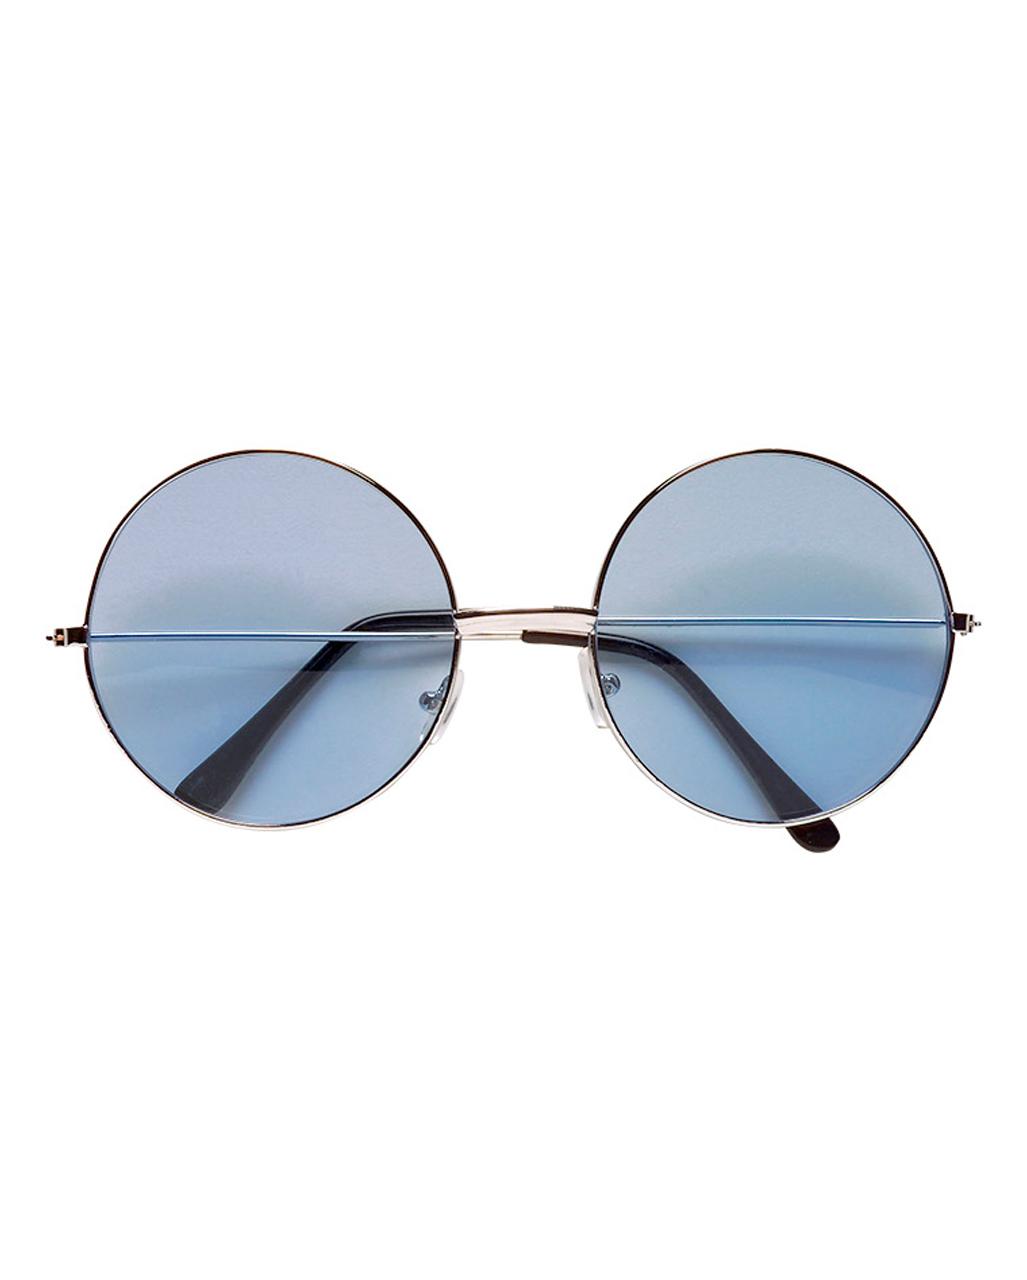 blaue 70er sonnenbrille als hippiebrille horror. Black Bedroom Furniture Sets. Home Design Ideas